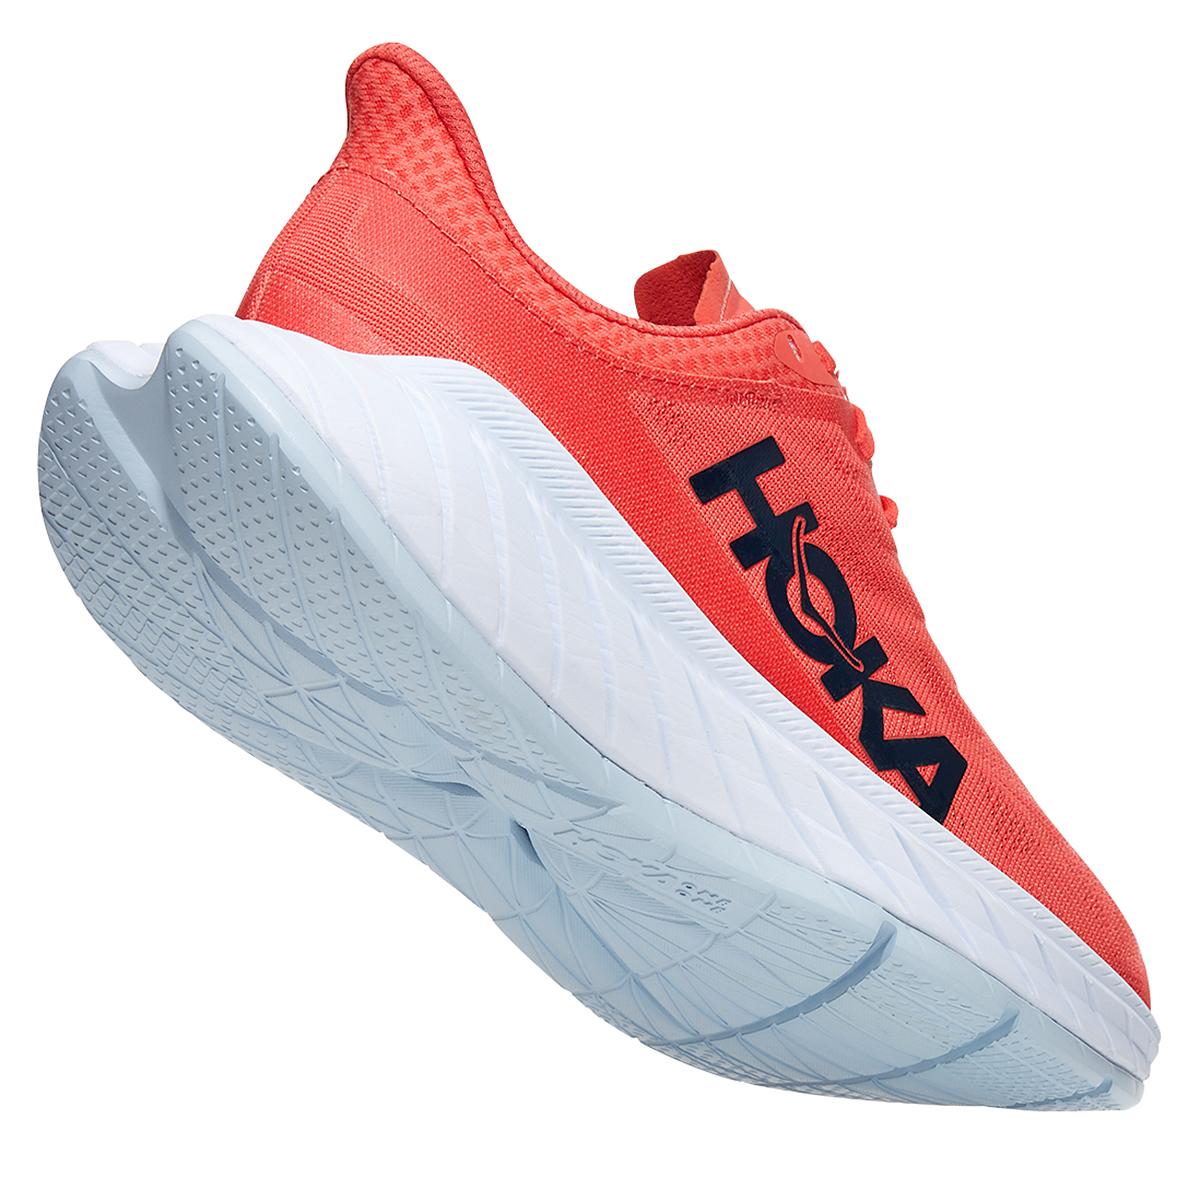 Women's Hoka One One Carbon X 2 Running Shoe - Color: Hot Coral/Black Iris - Size: 5 - Width: Regular, Hot Coral/Black Iris, large, image 3